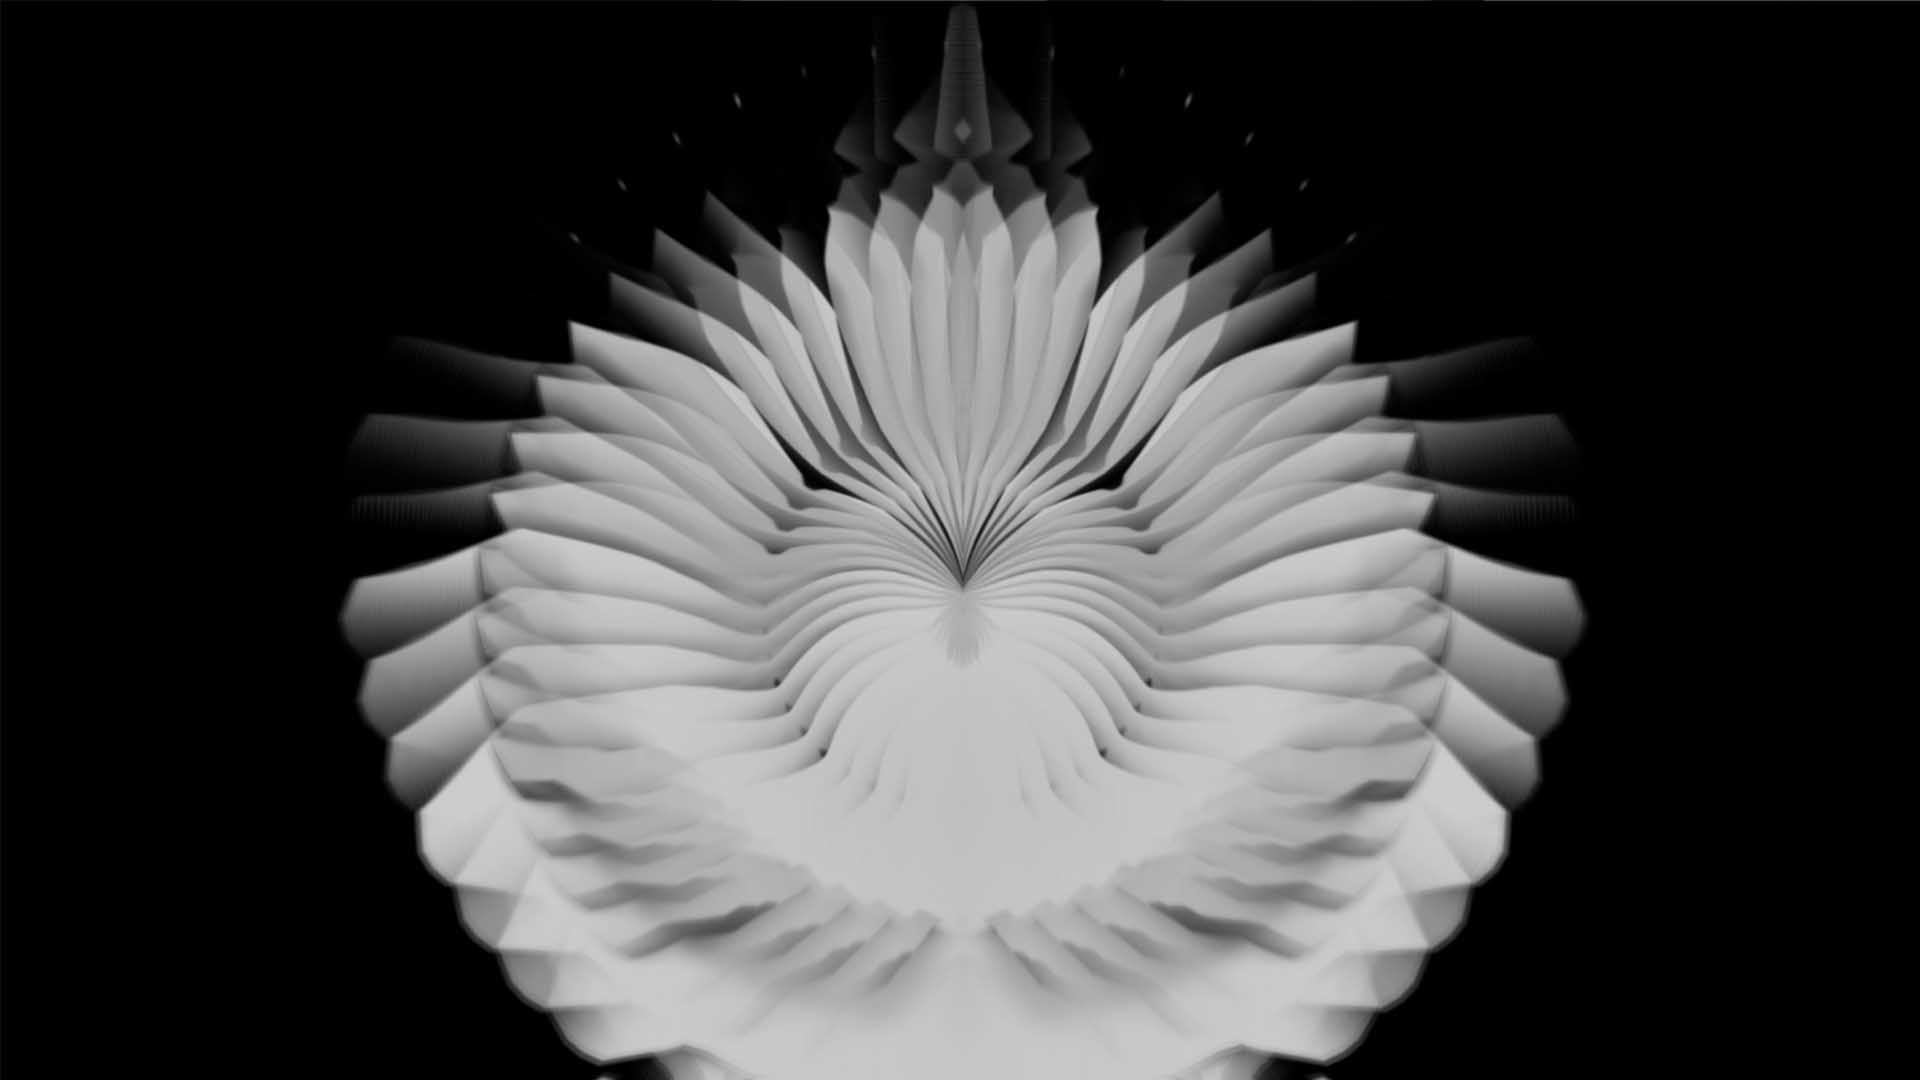 3D Motion background